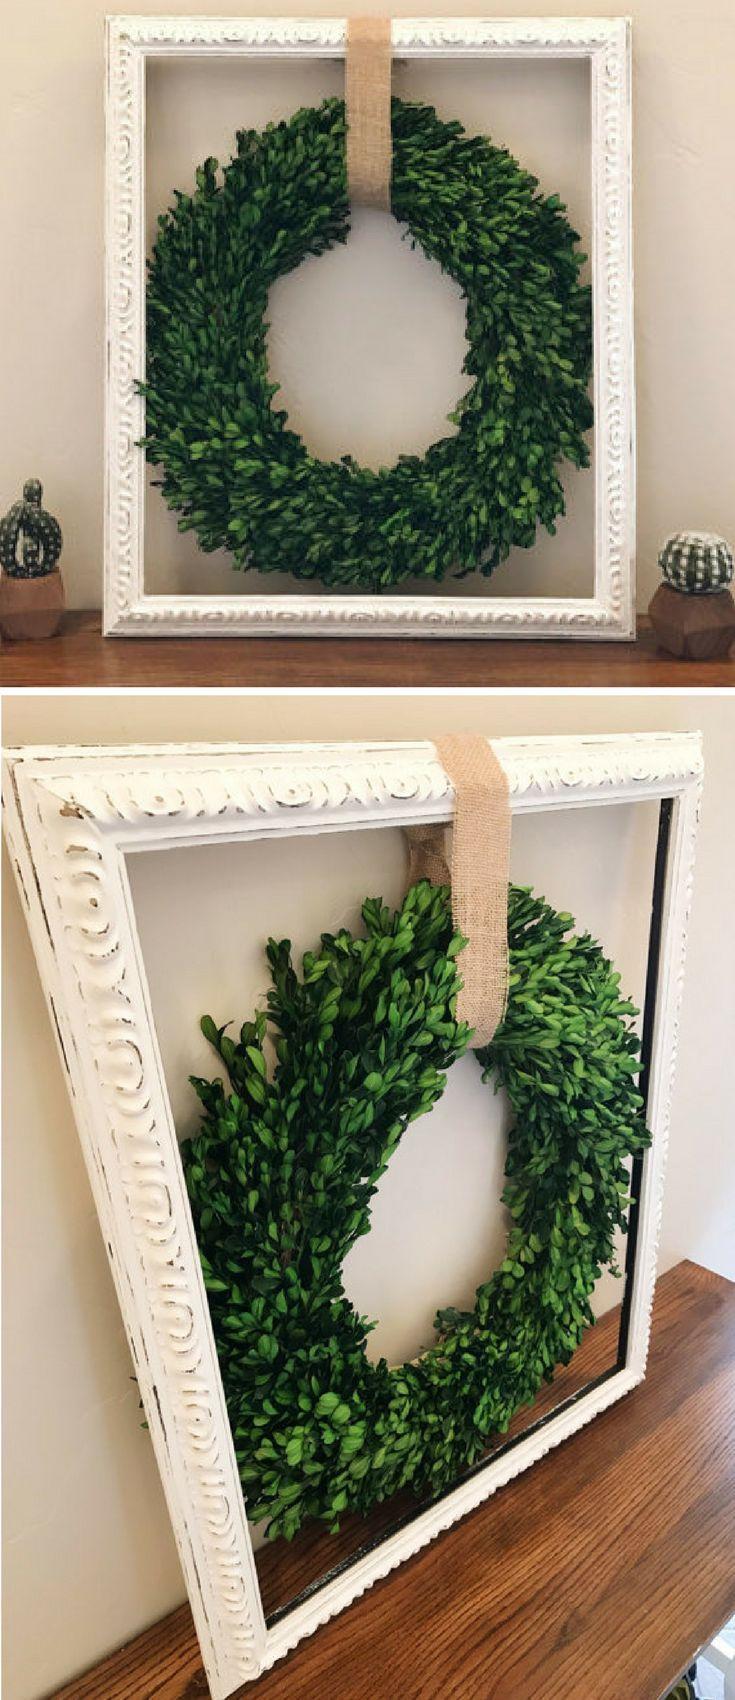 Cottage Style Wreath, Farmhouse Decor, Indoor Wreath, Rustic Mantel Decor, Shabby Chic Wreath, Rustic Cottage Style, living room wall decor, Wreath in Frame, Farmhouse sign, Farmhouse wall art, Rustic sign, gift idea, home decor #ad